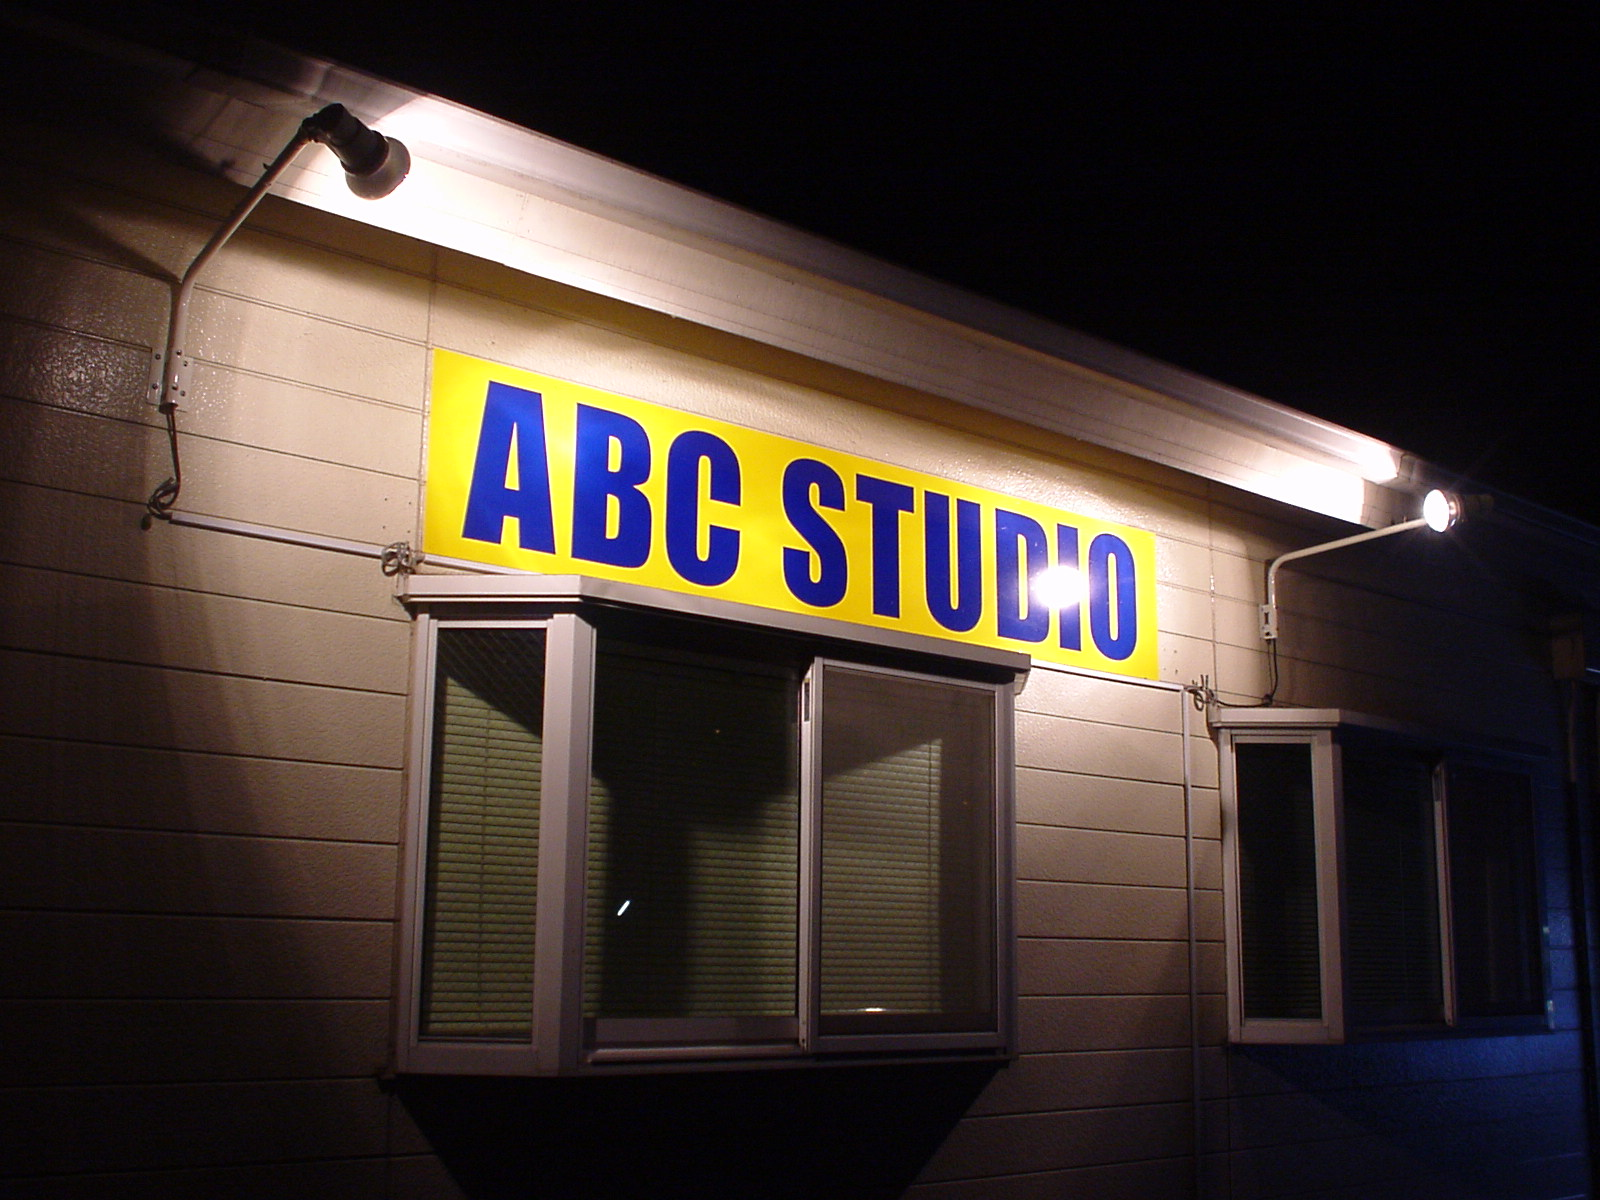 ABCSTUDIO